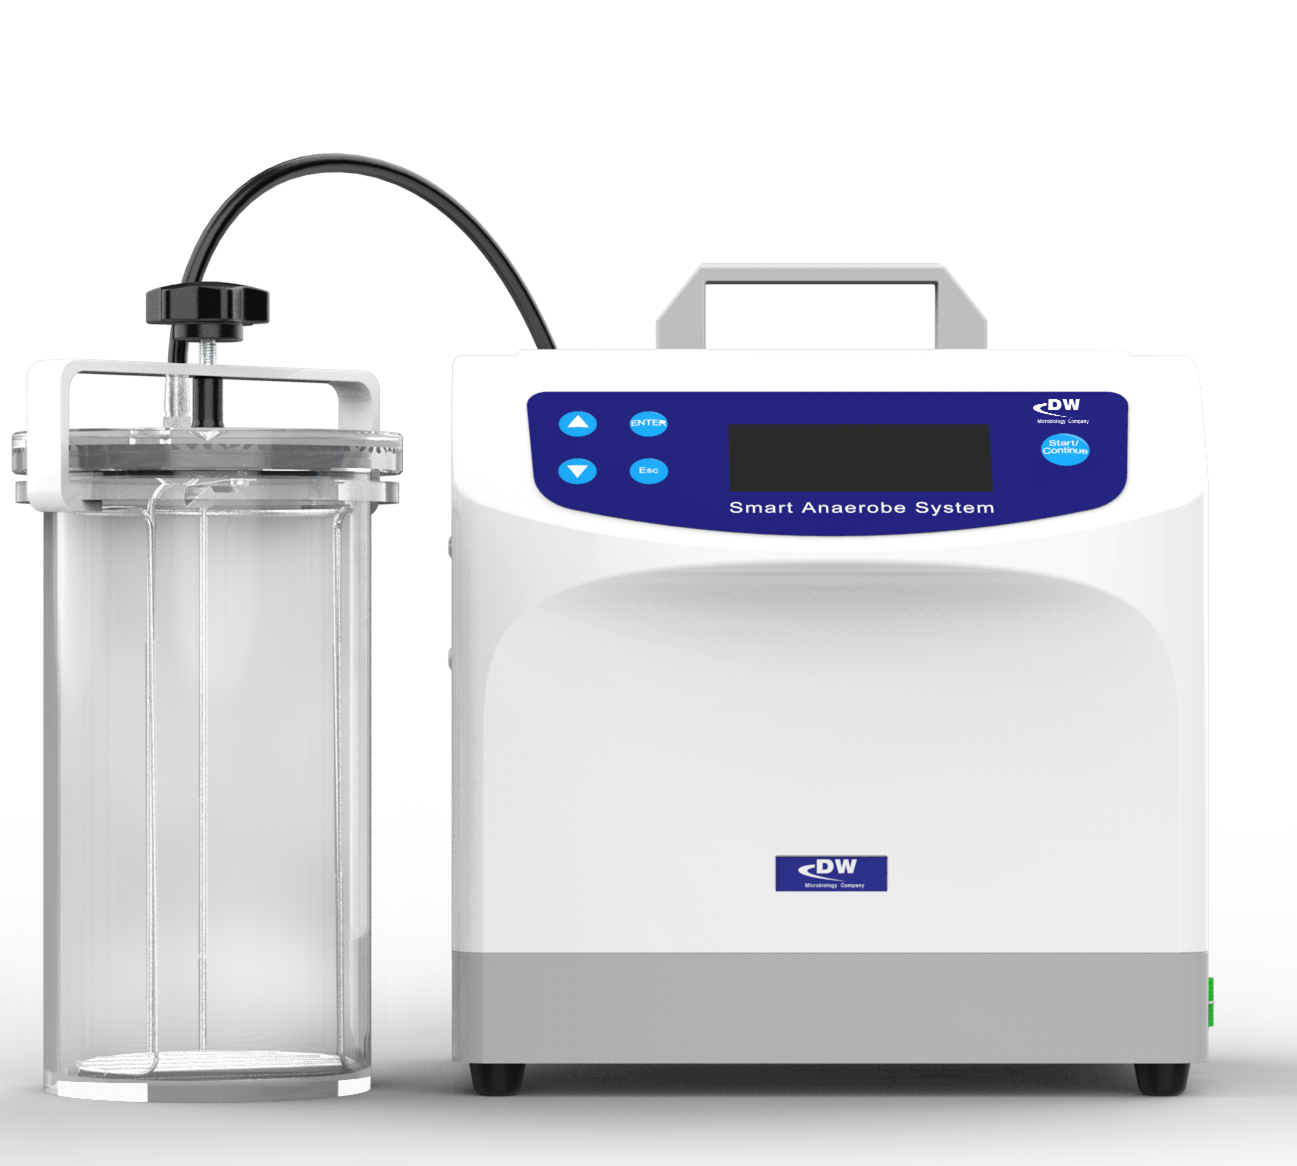 DW-100A-K型 智能厌氧微生物培养系统(一机多用,满足厌氧菌、微需氧菌培养环境自动生成)